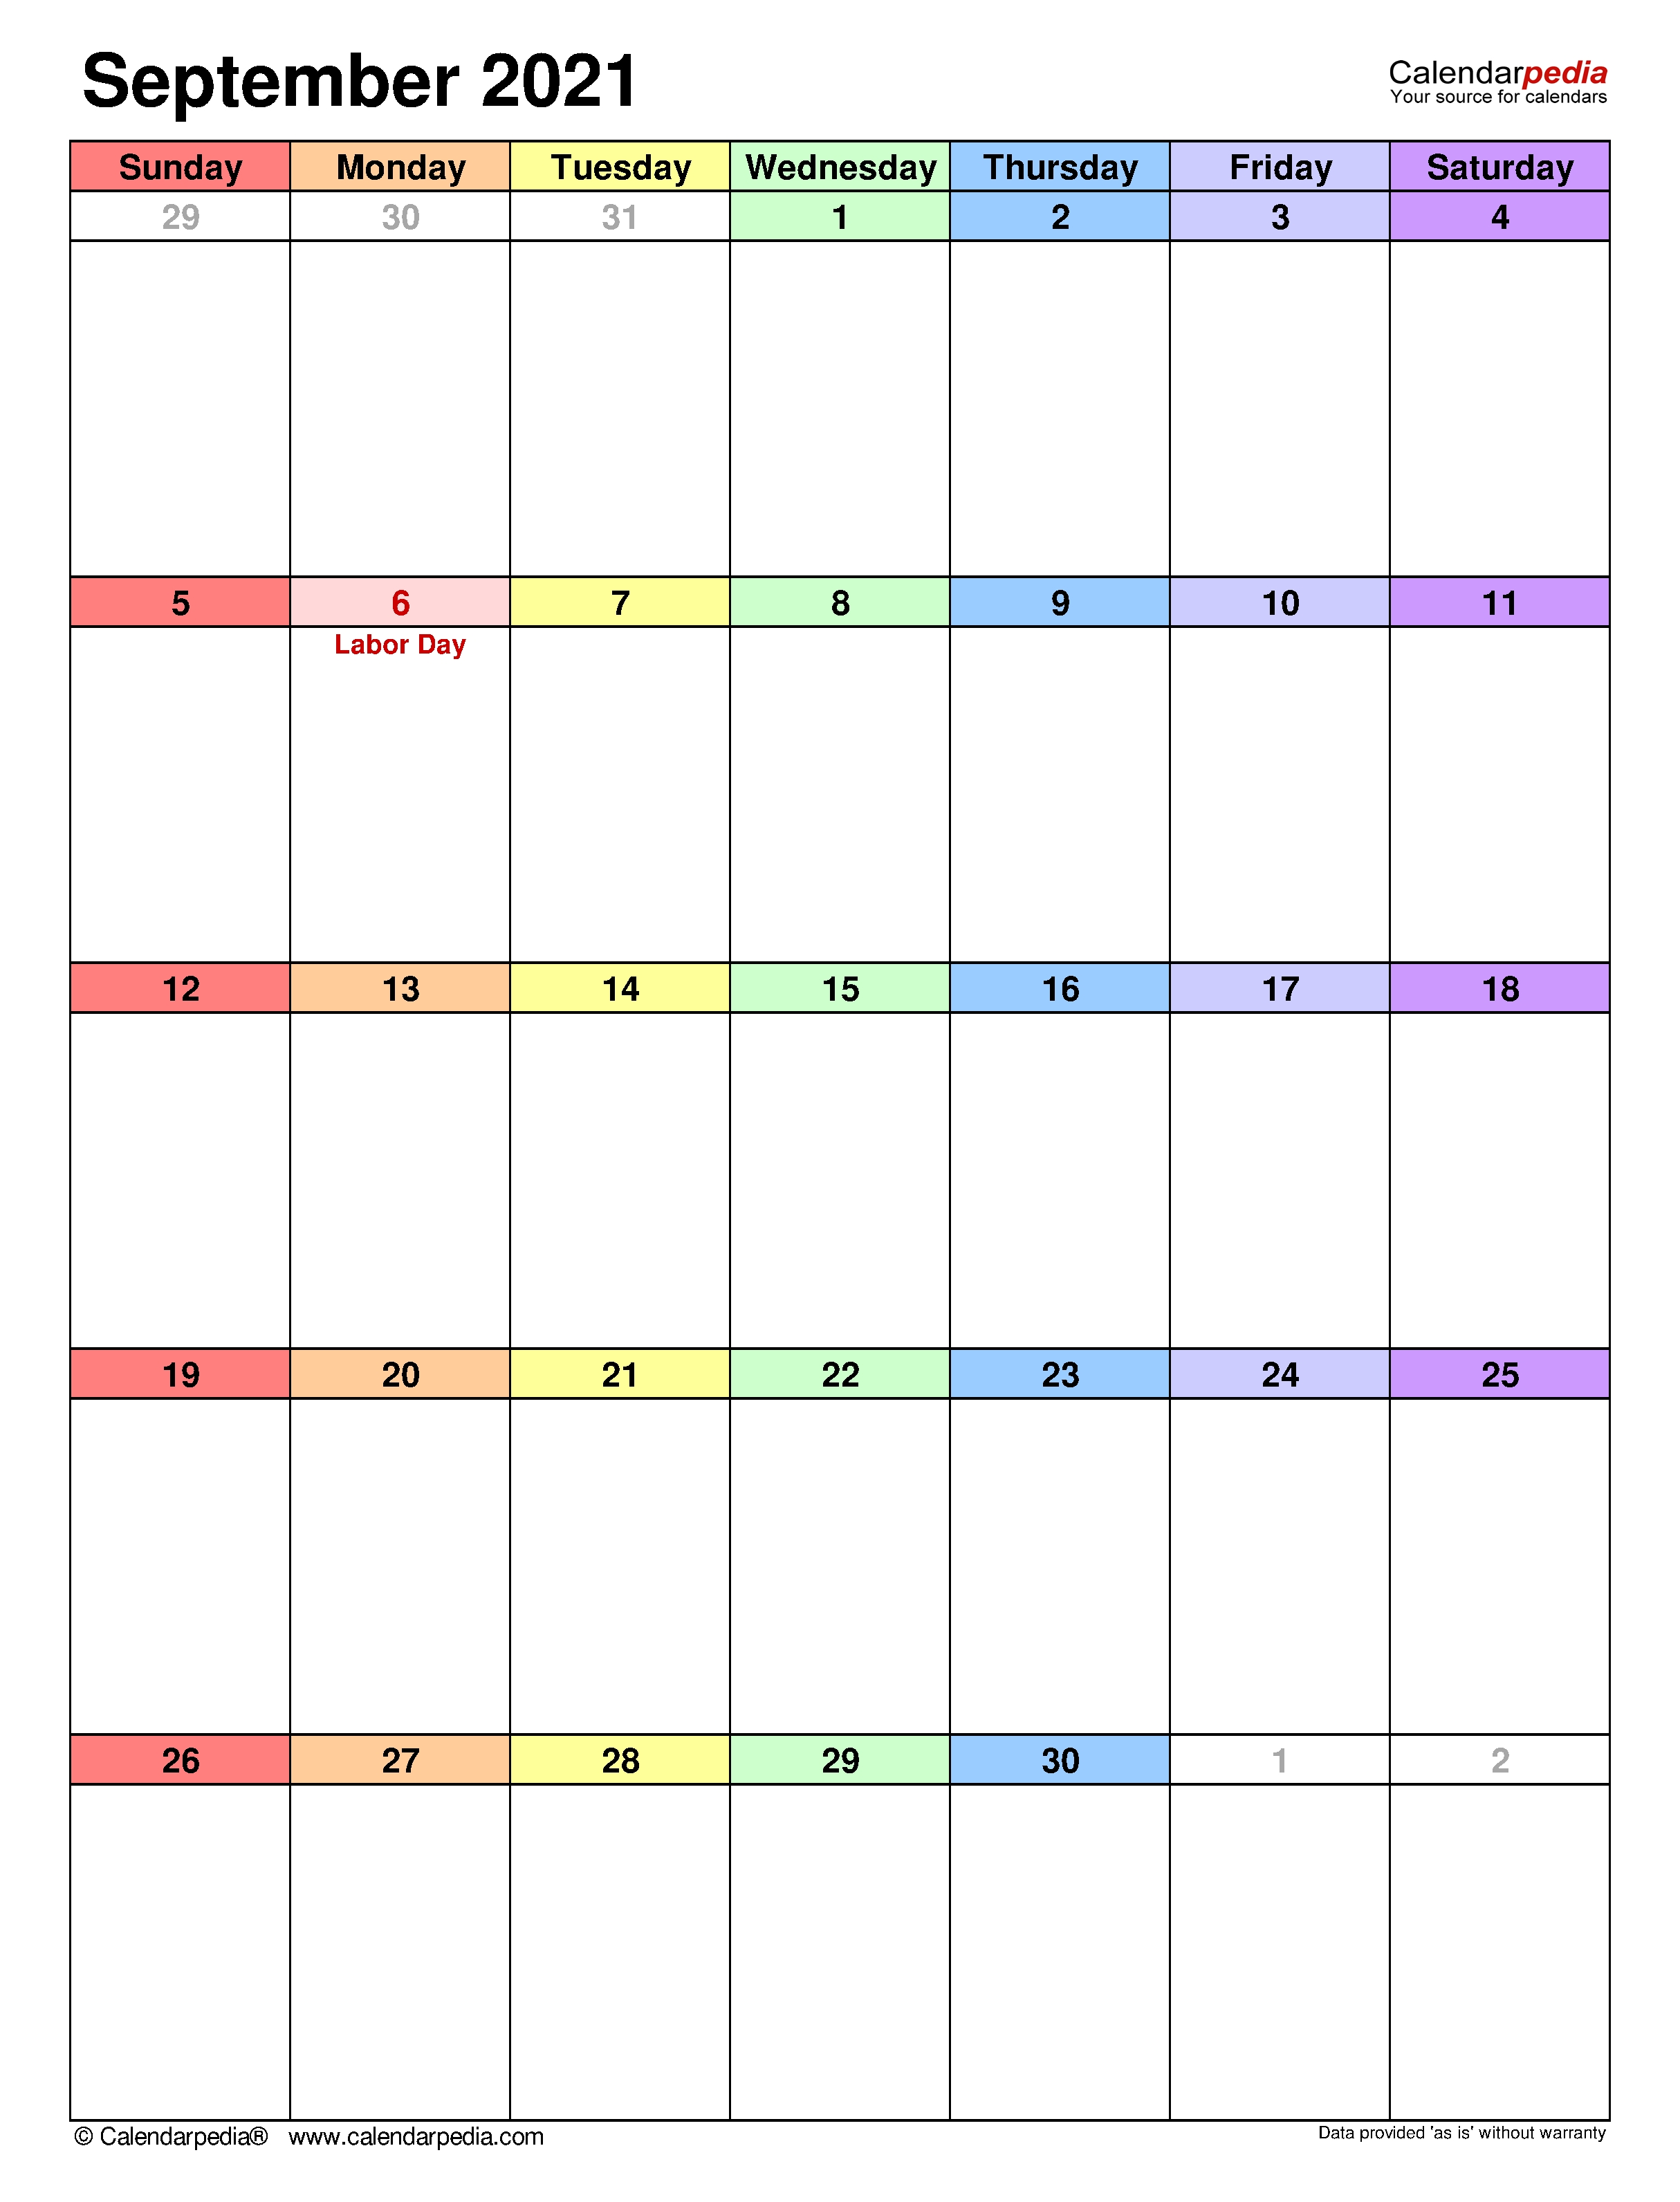 September 2021 Calendar | Templates For Word, Excel And Pdf September 2021 Calendar Template